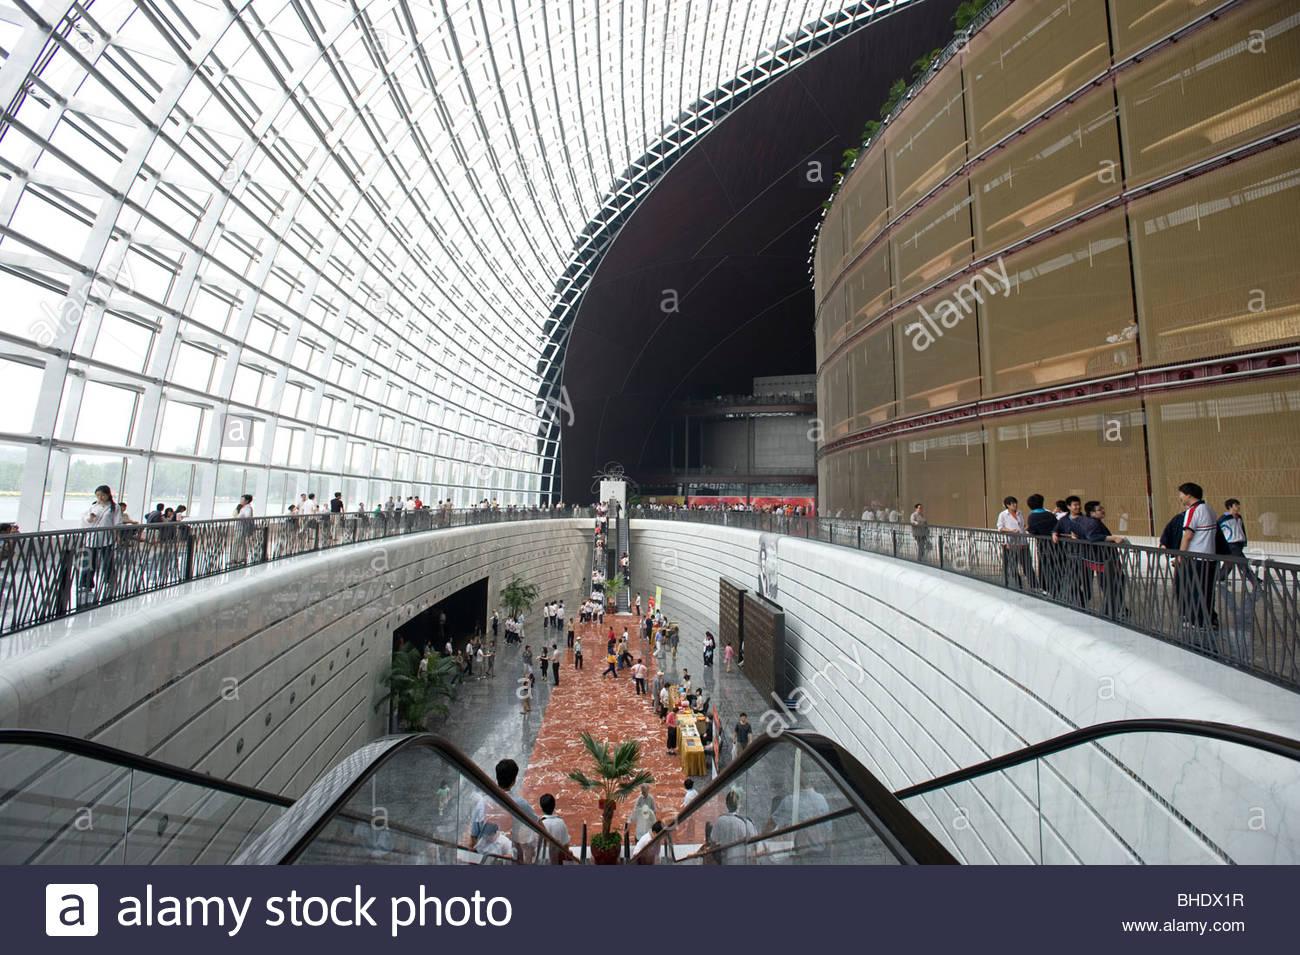 French Architect the opera designedfrench architect paul andreu, took nine